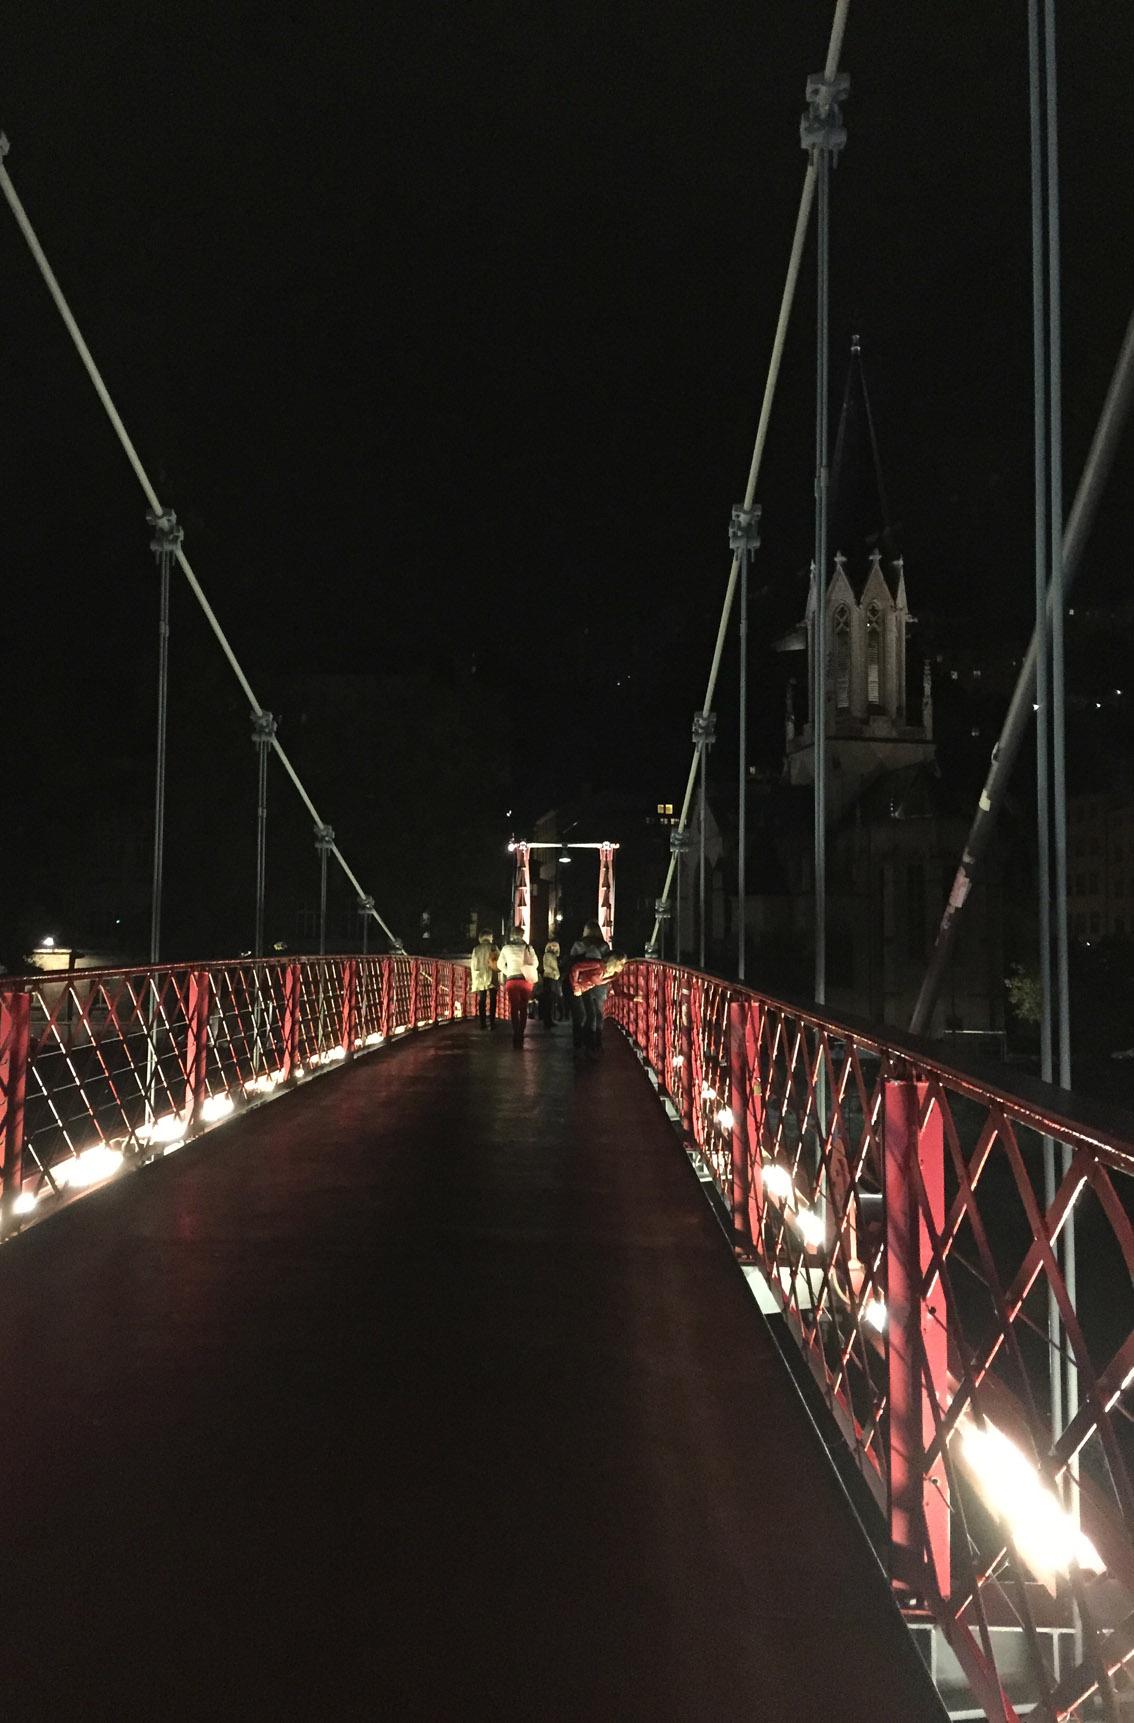 Graines de baroudeurs_Lyon by night (3)